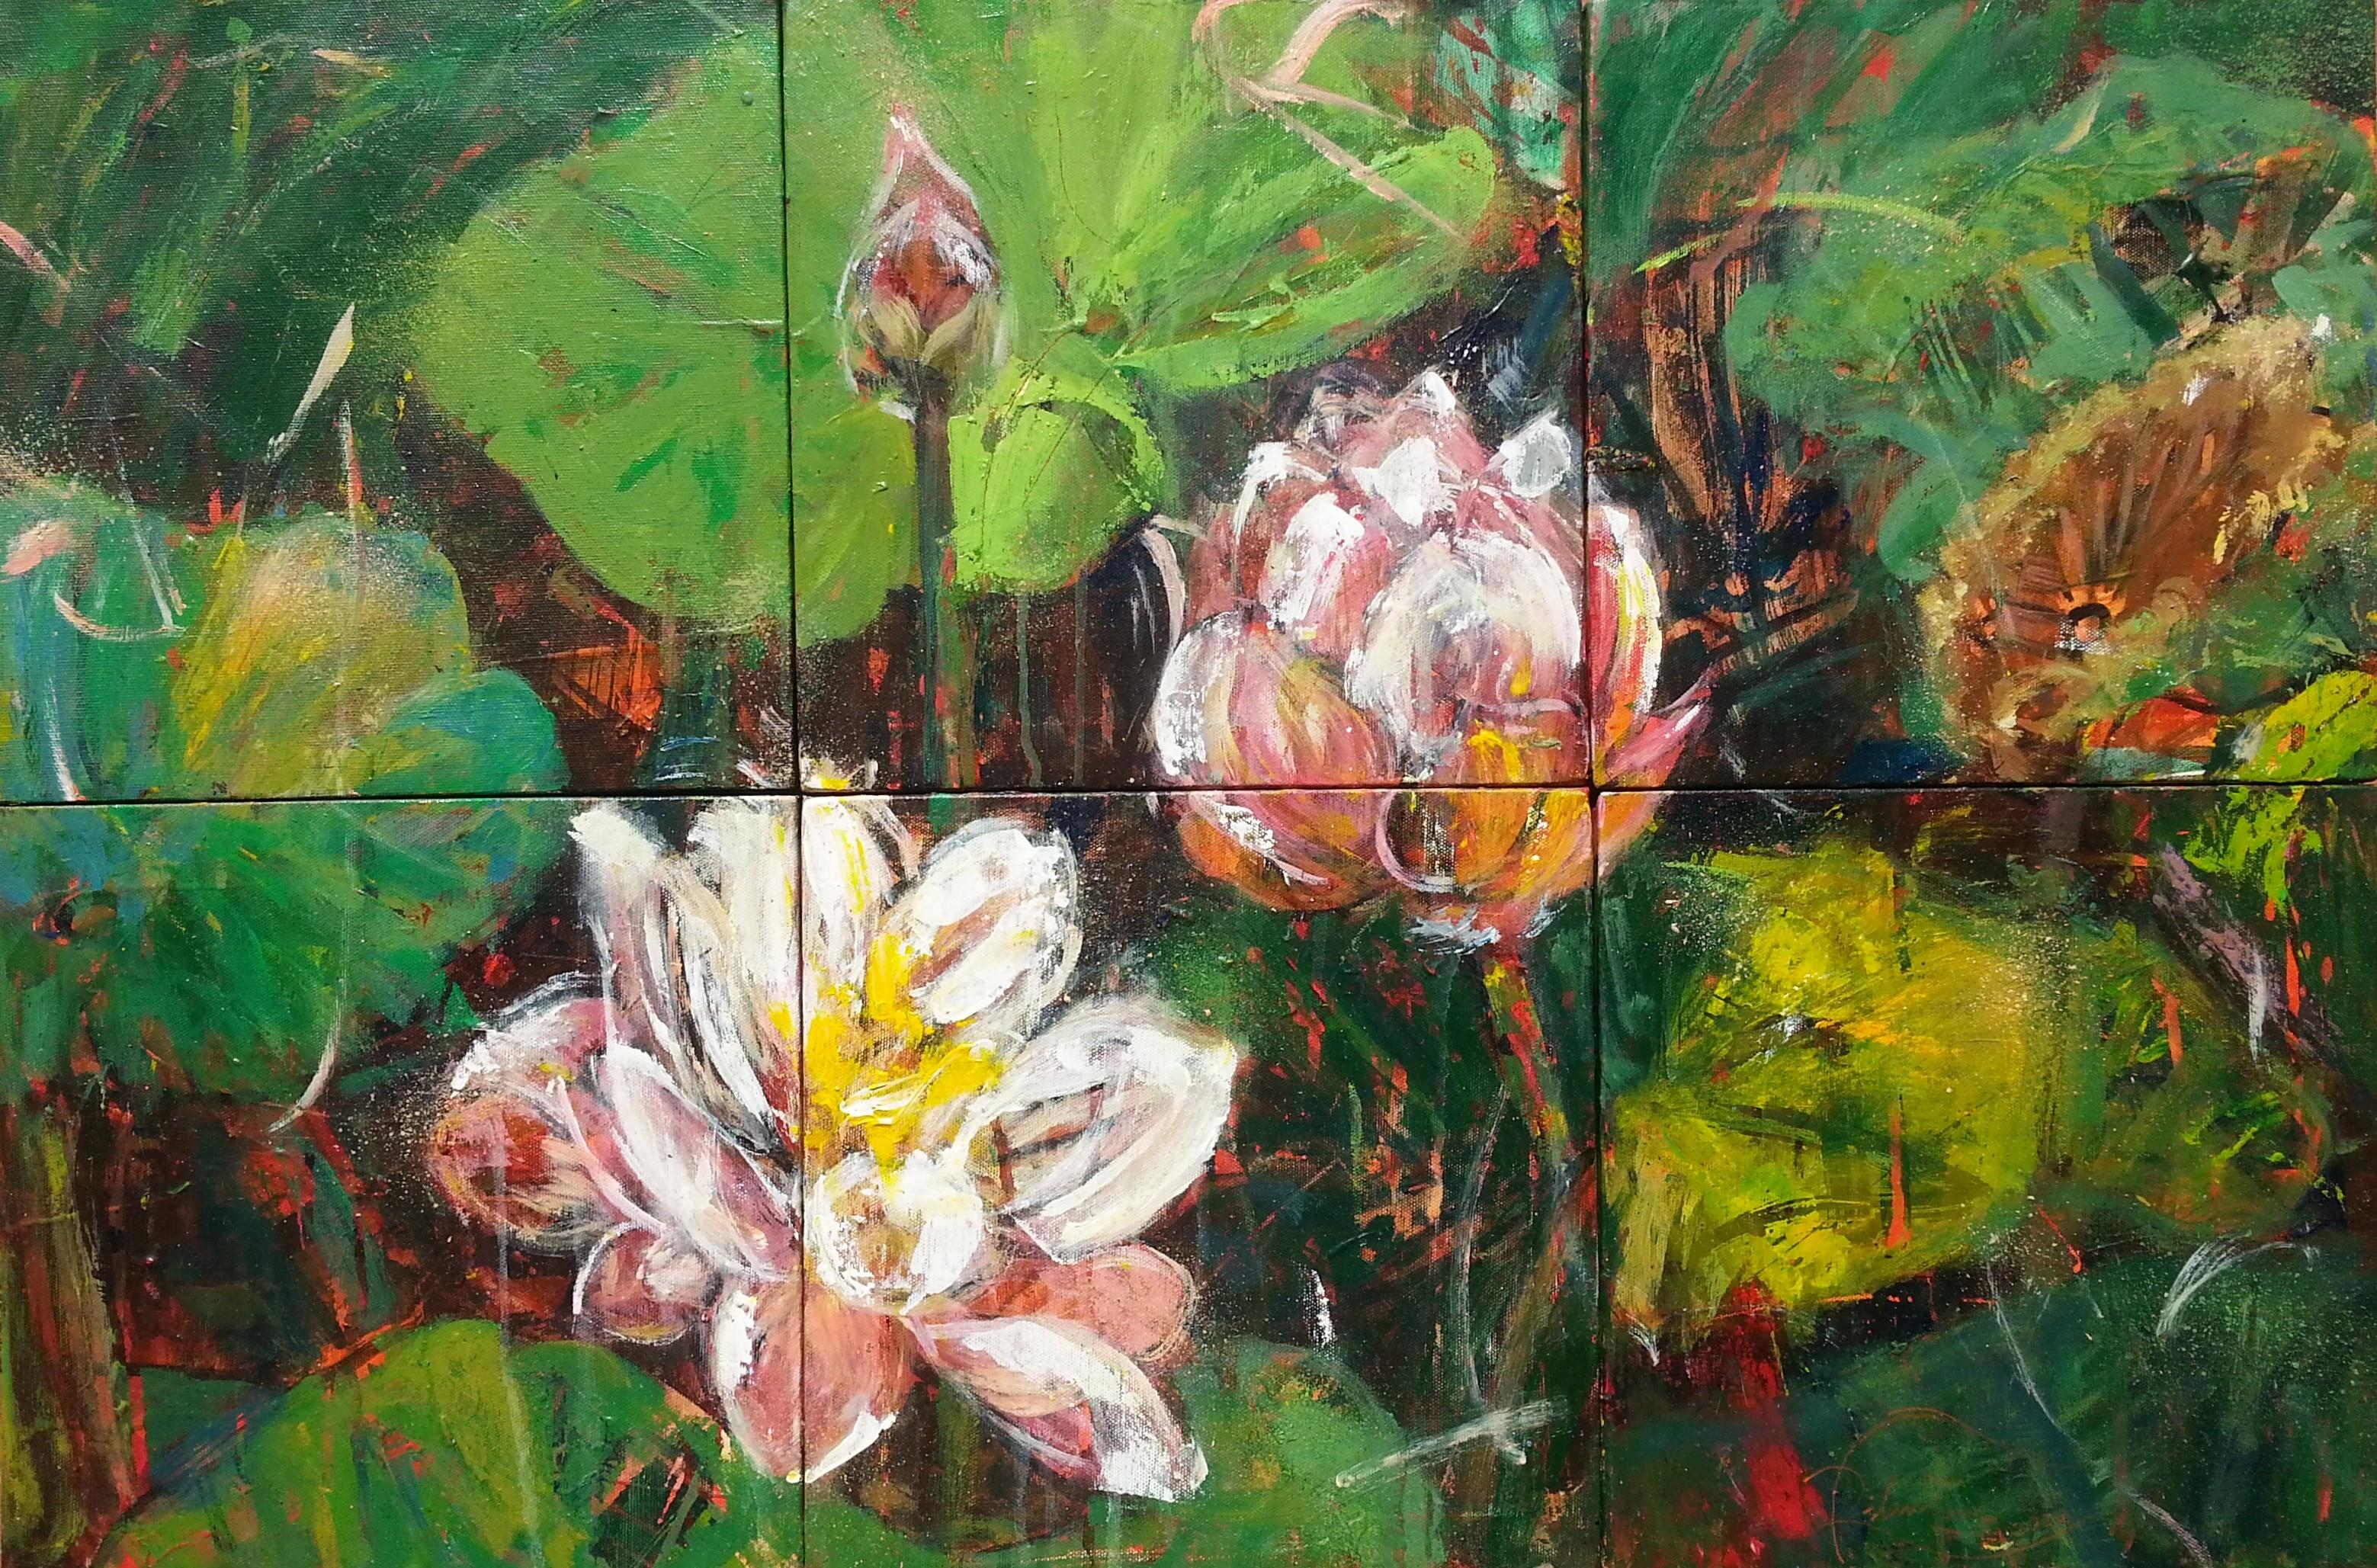 Untitied by Dilantha Upul